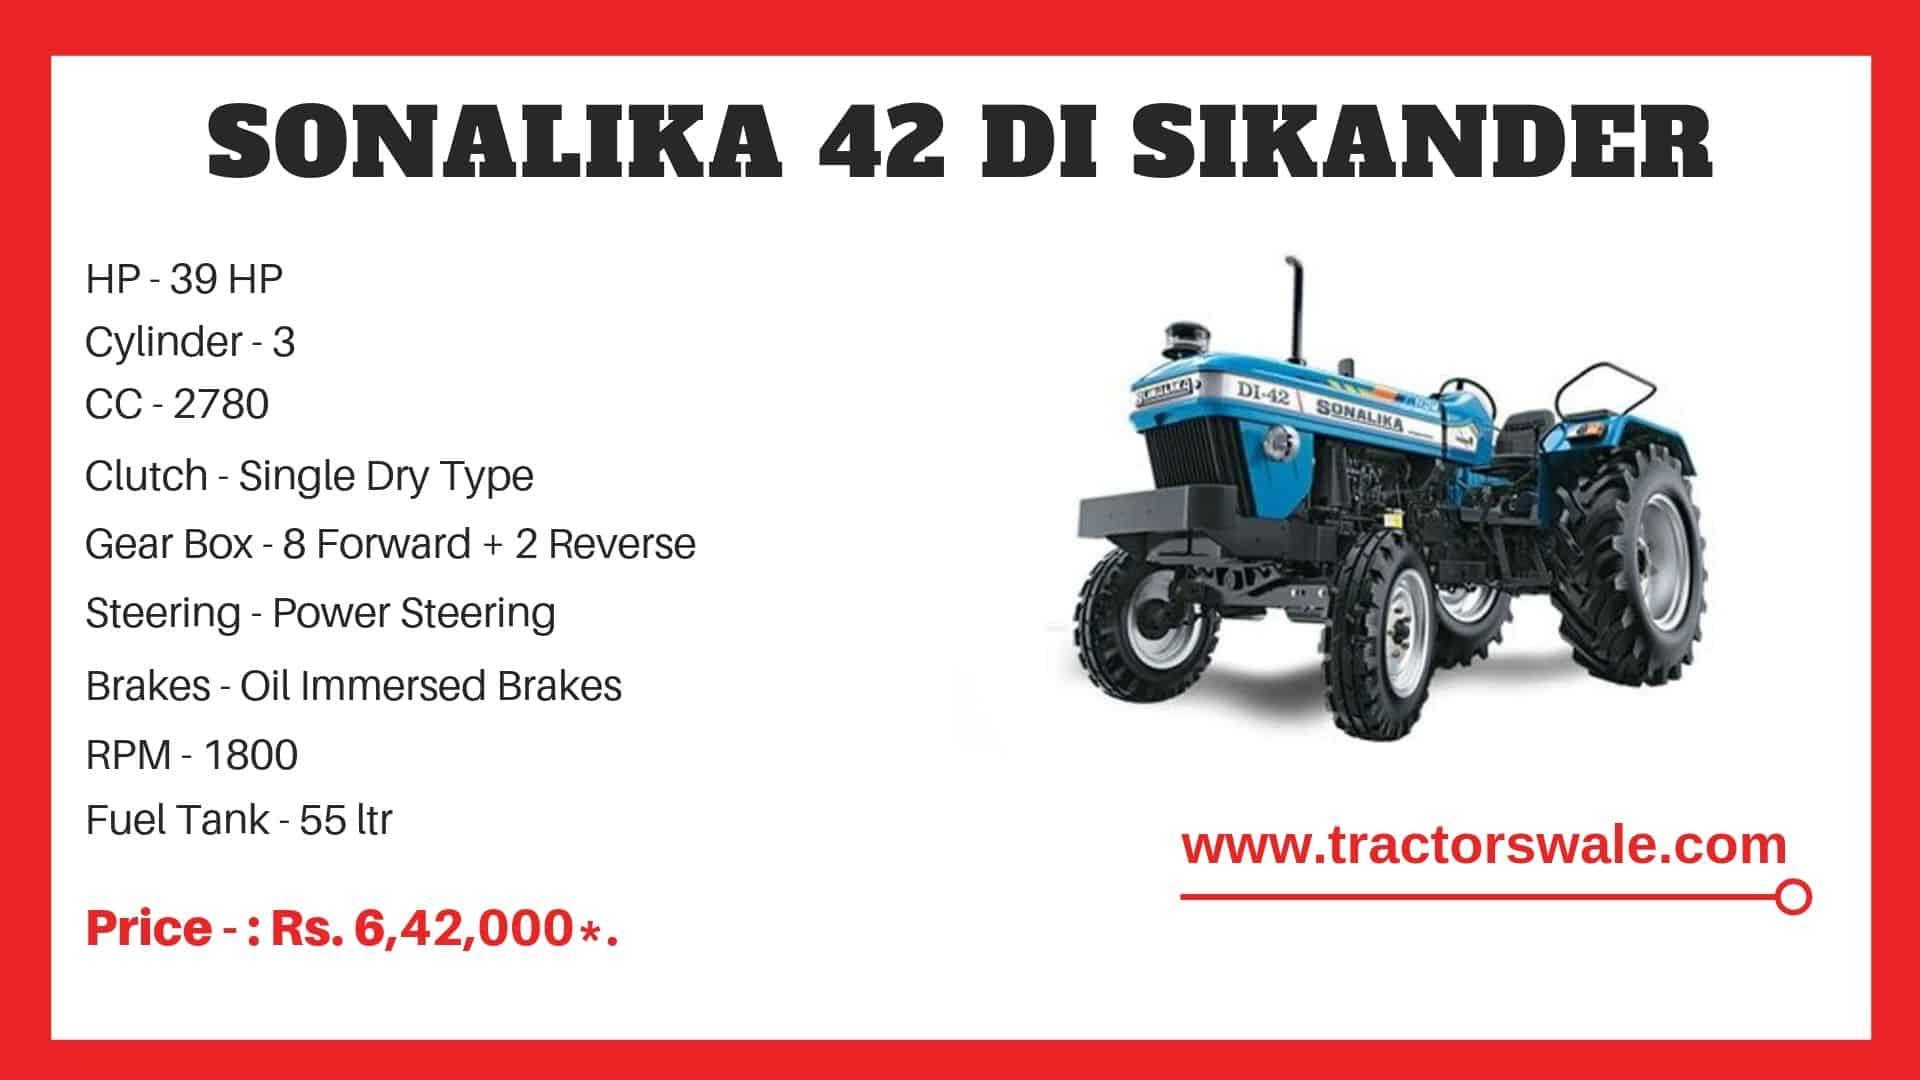 Sonalika 42 DI Sikander tractor specs